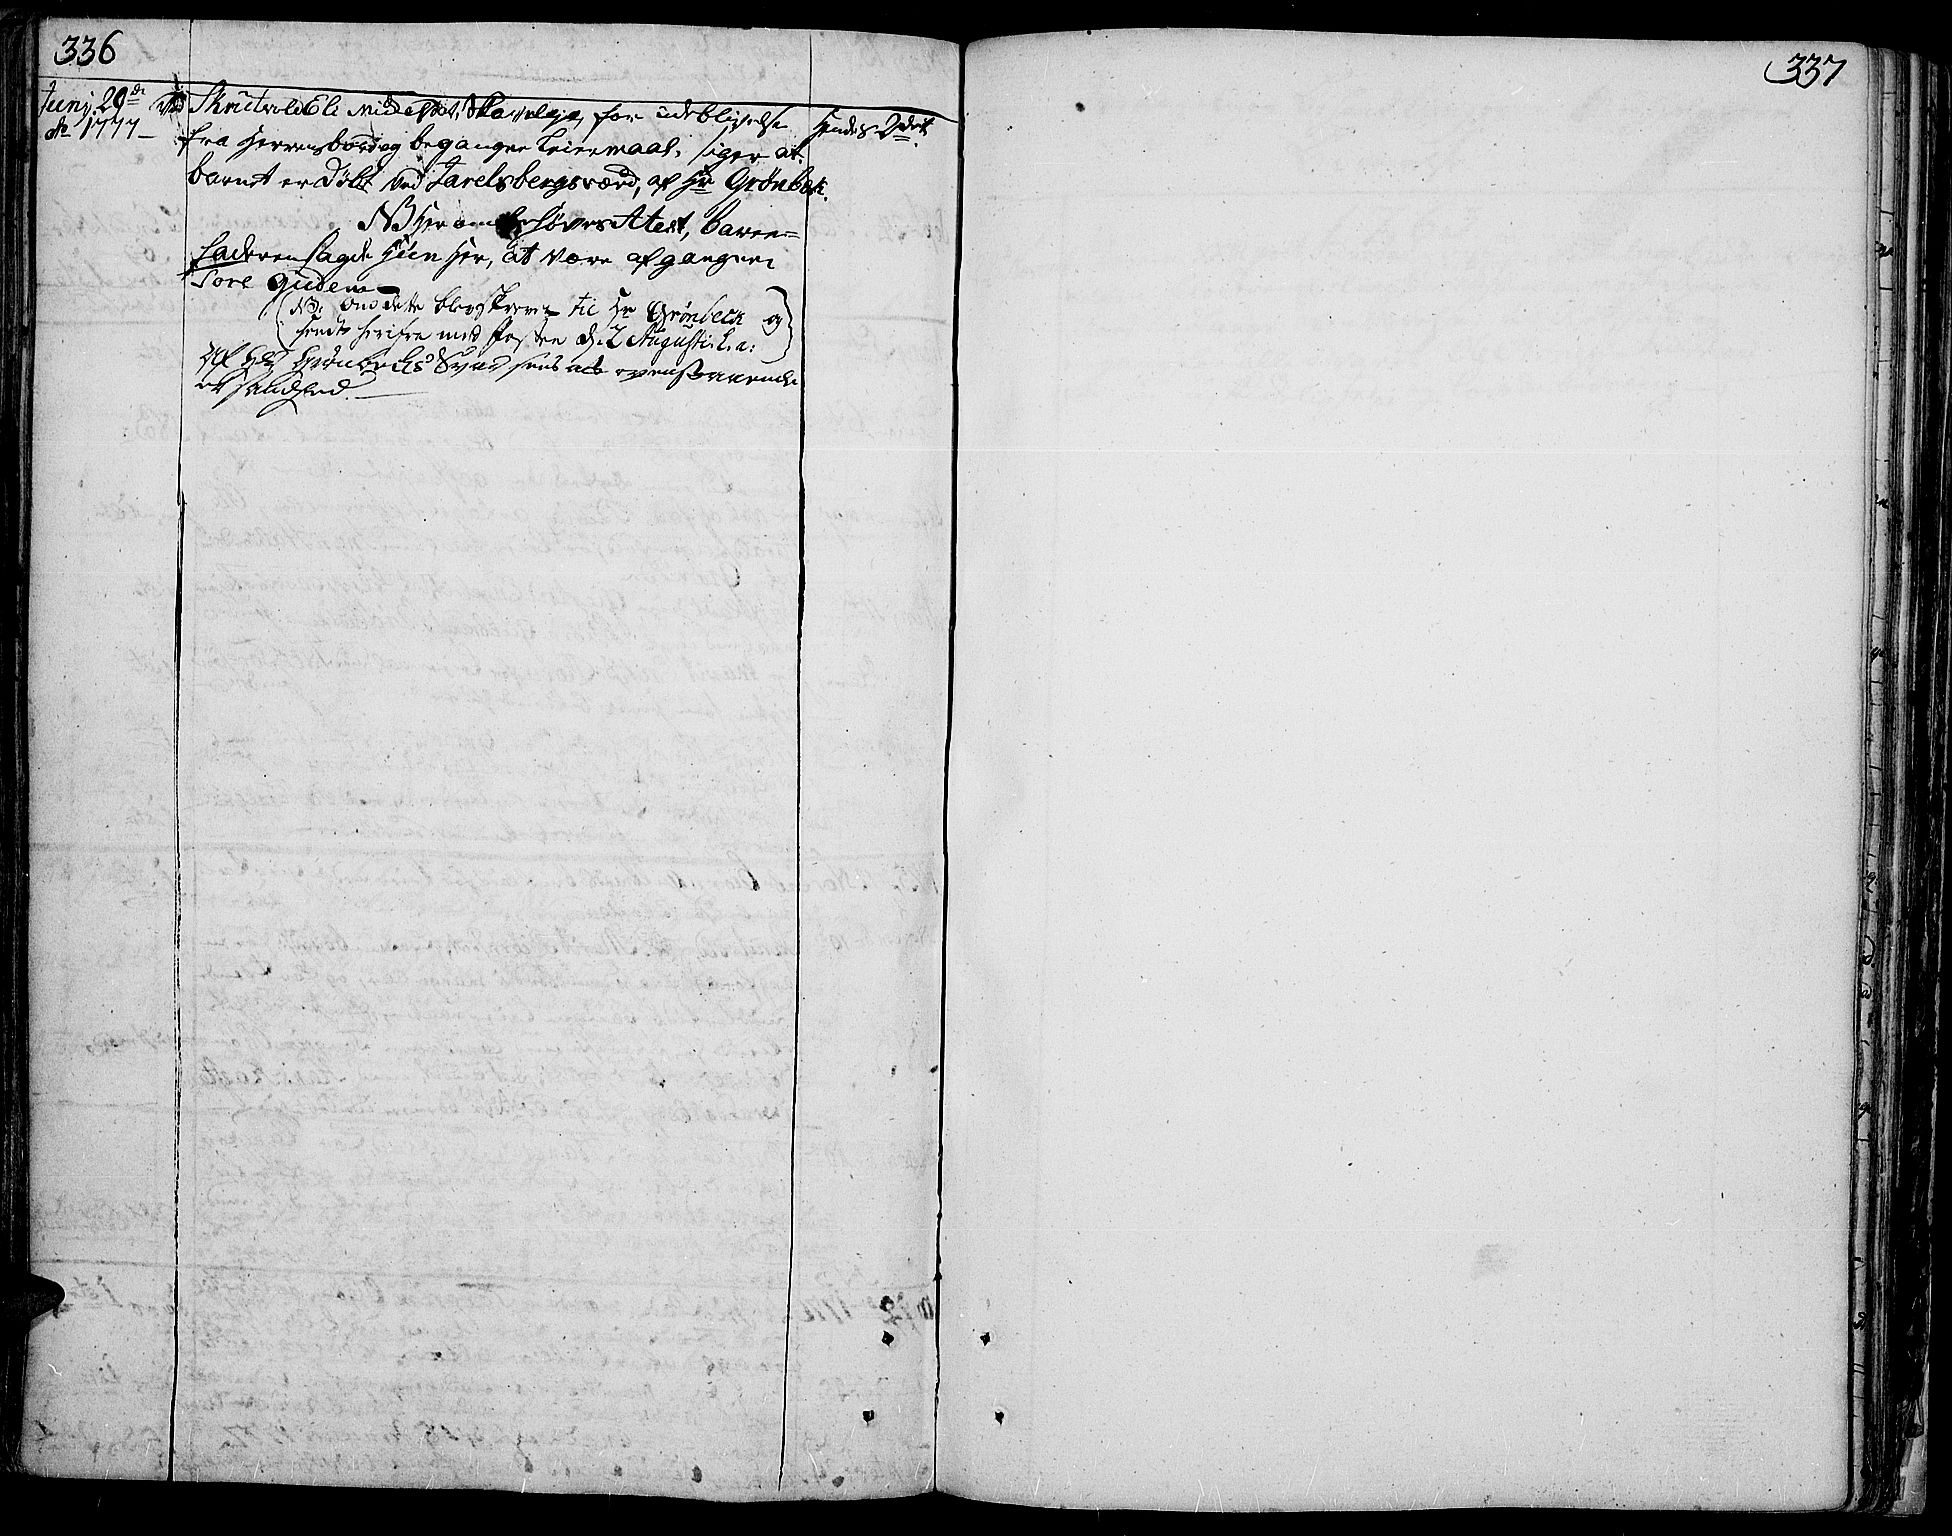 SAH, Aurdal prestekontor, Ministerialbok nr. 5, 1763-1781, s. 336-337